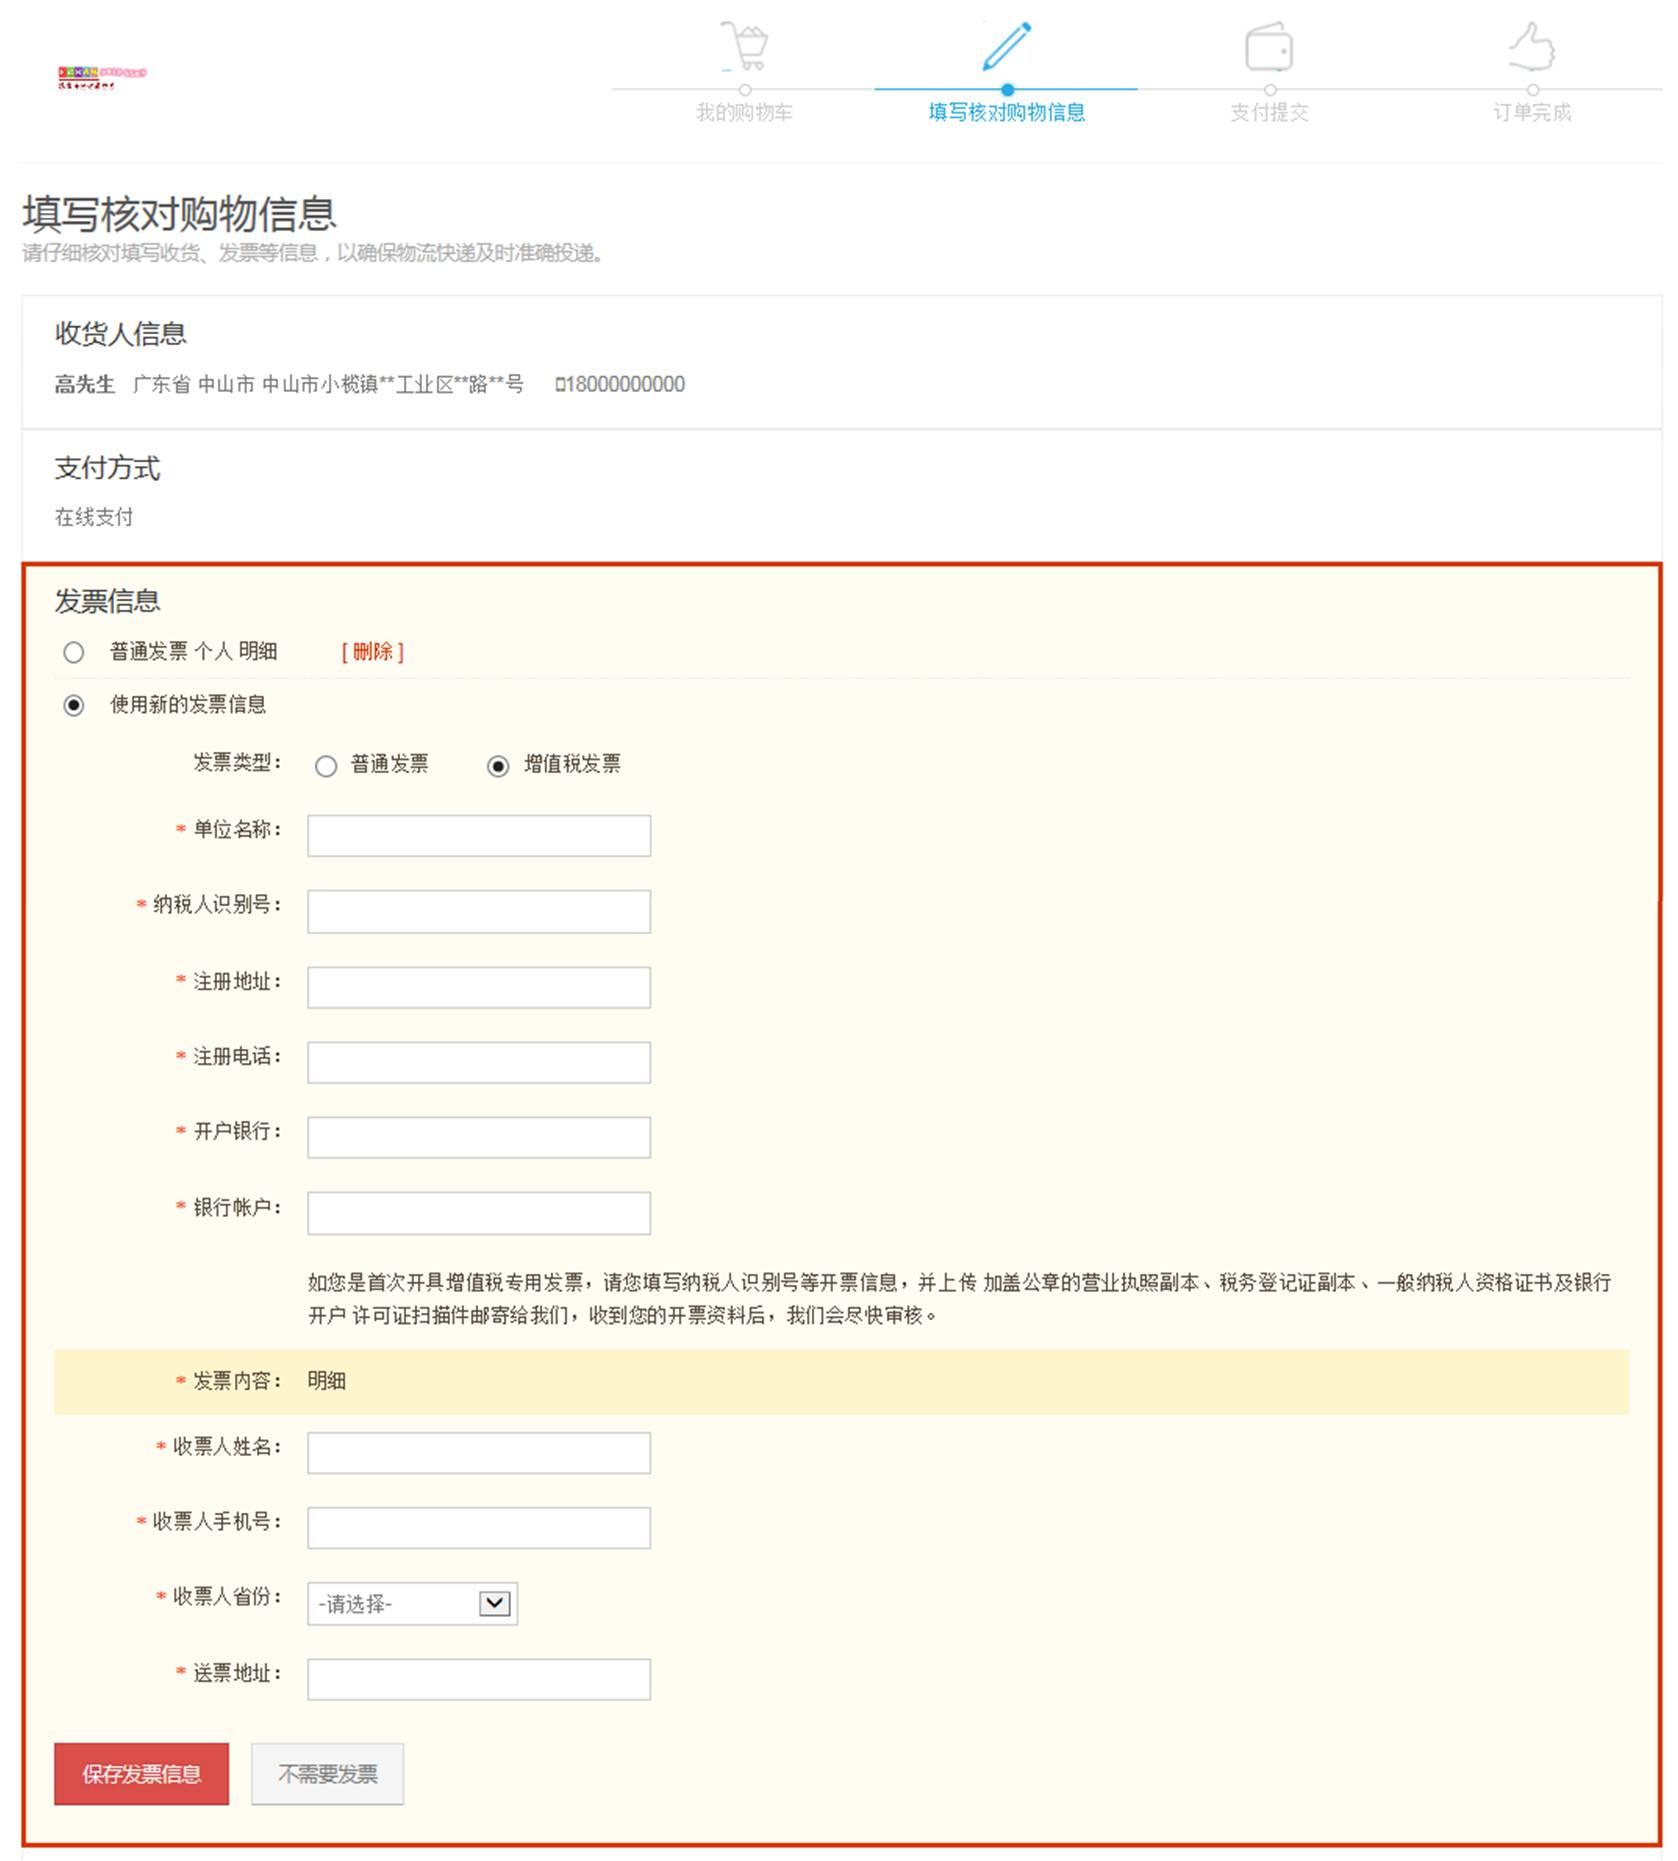 http://images.pcb.cn/shop/article/04899262570021810.jpg